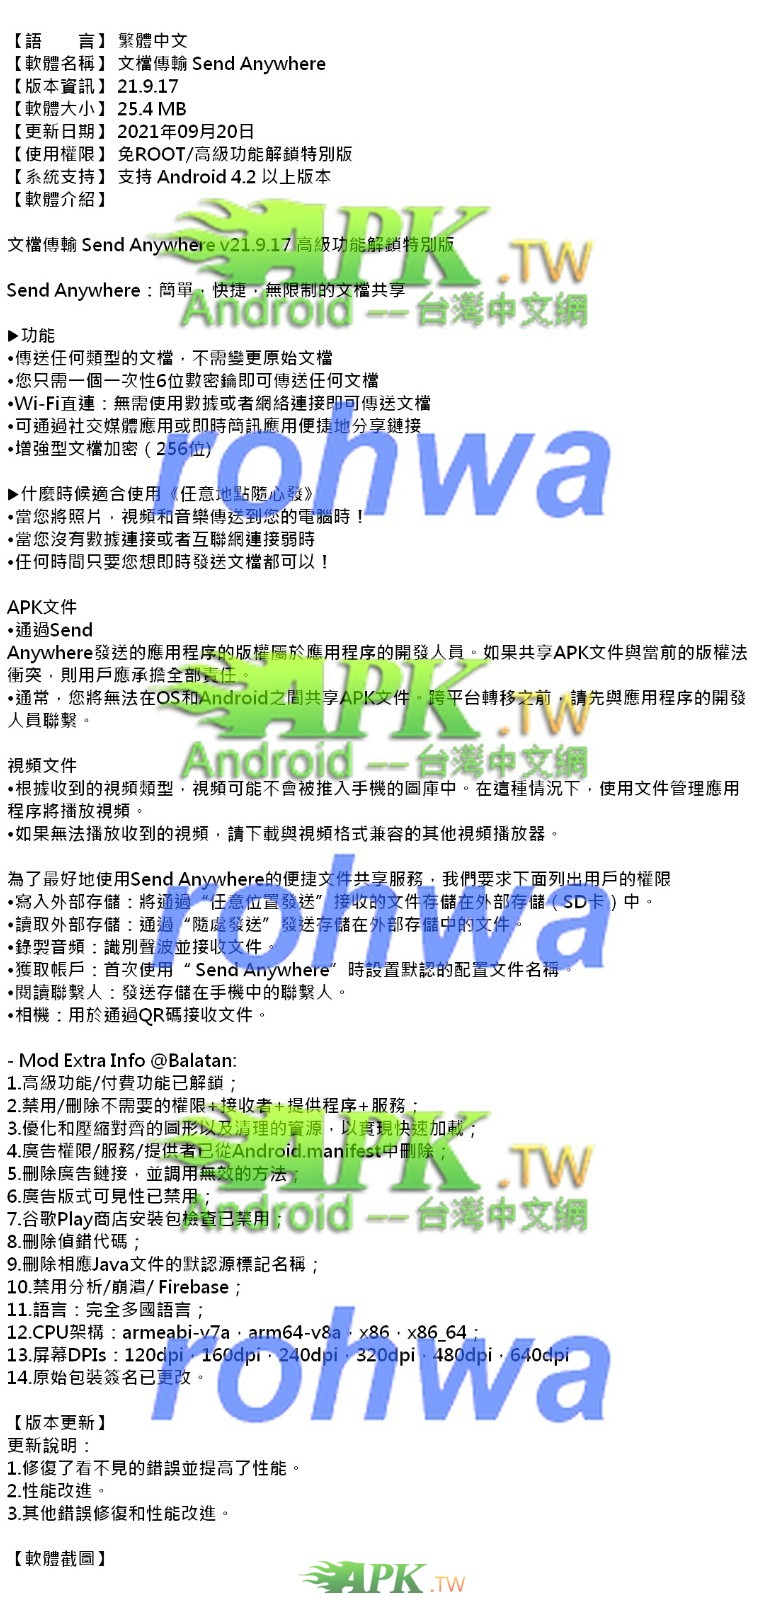 SendAnywhere_Premium_21.9.17_.jpg